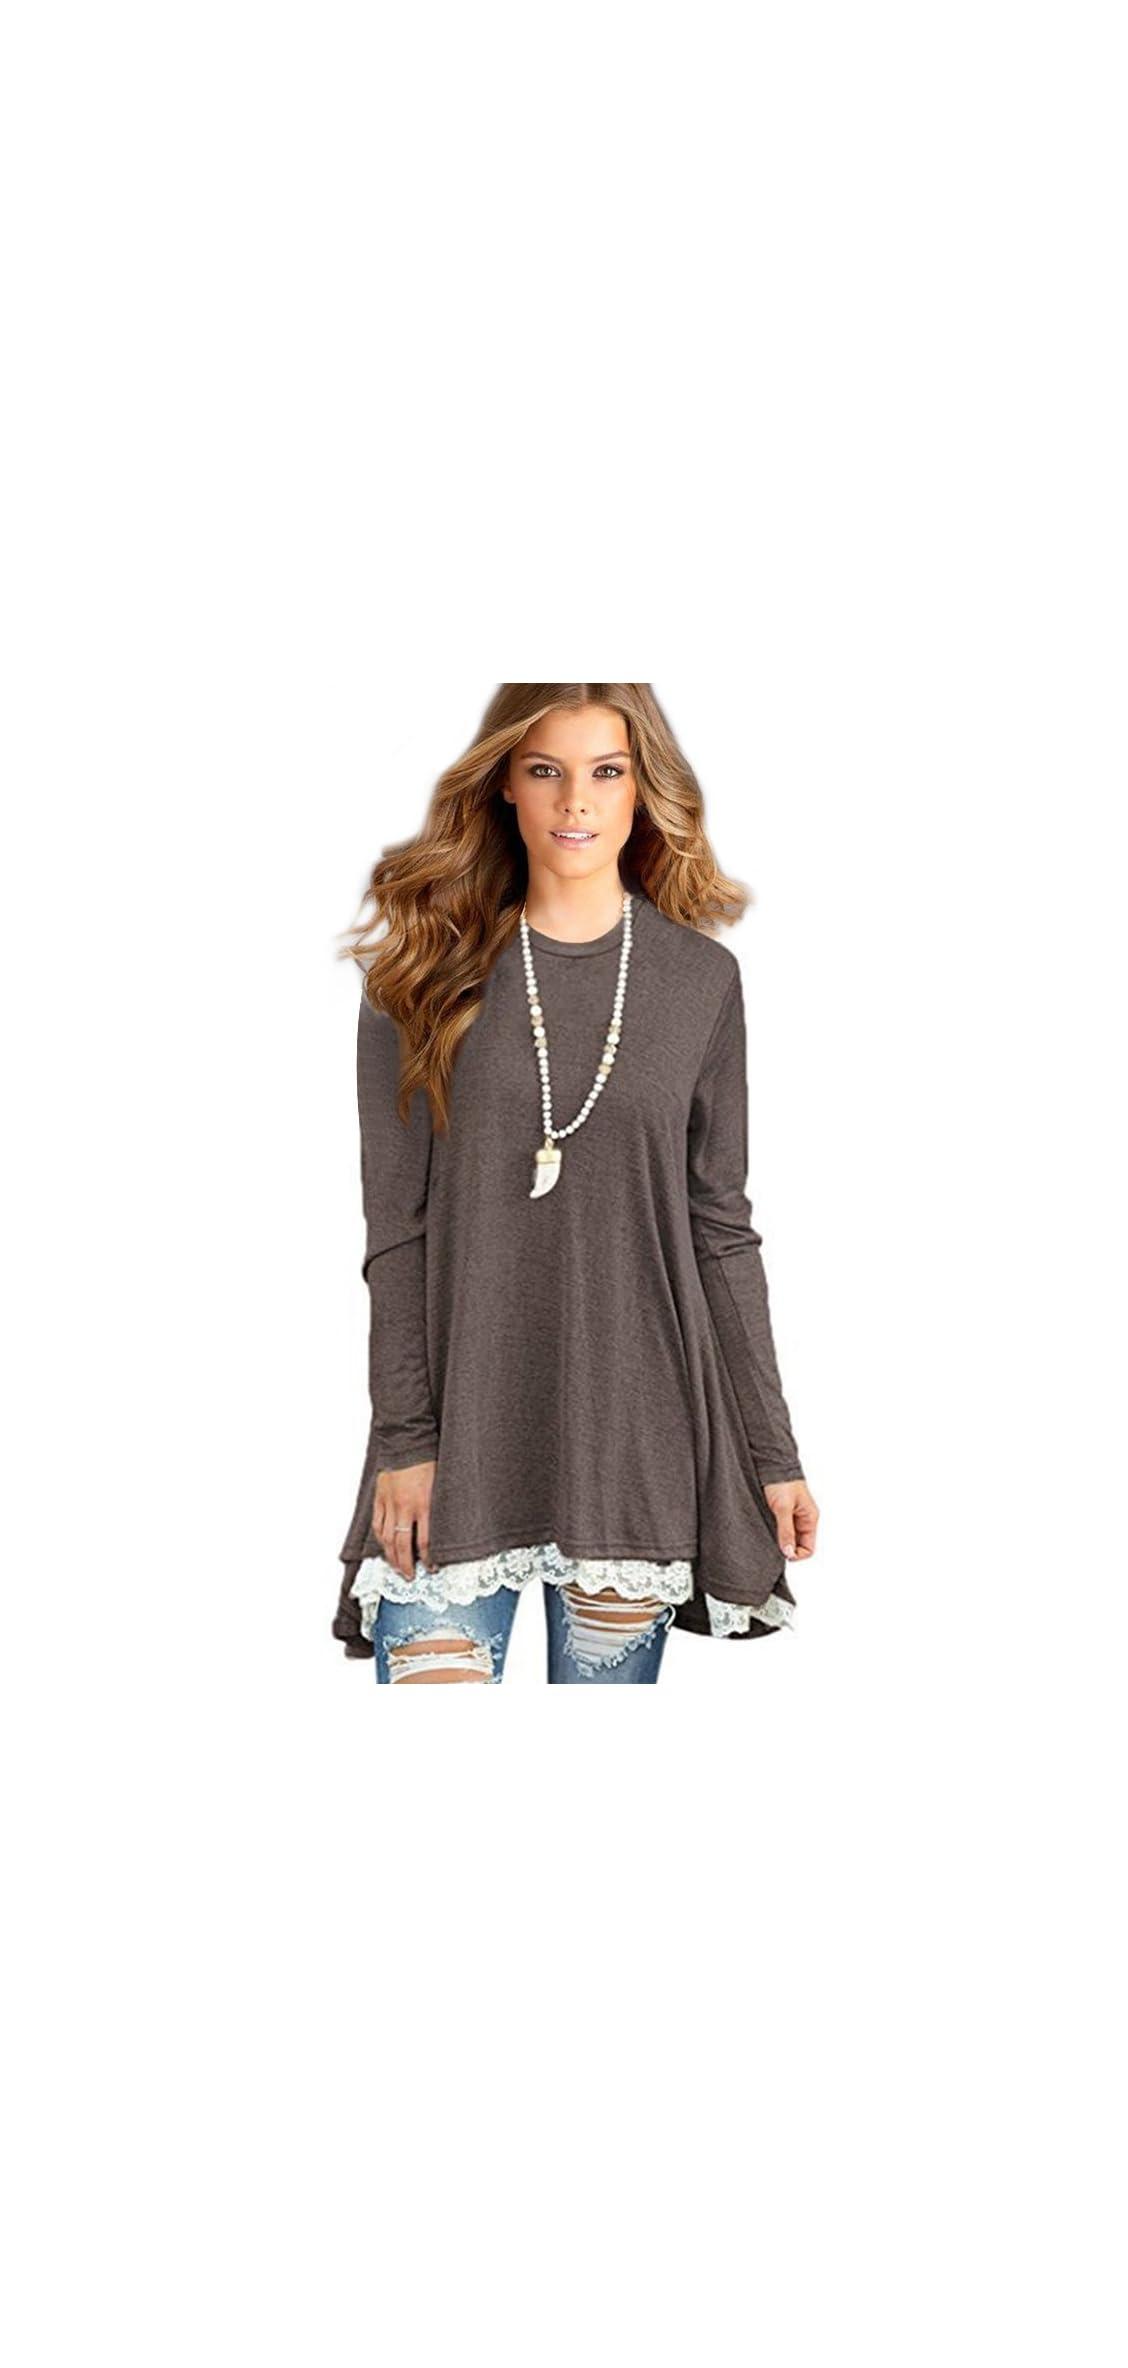 Women's Lace Long Sleeve Tunic Tops Shirt Clothing Scoop